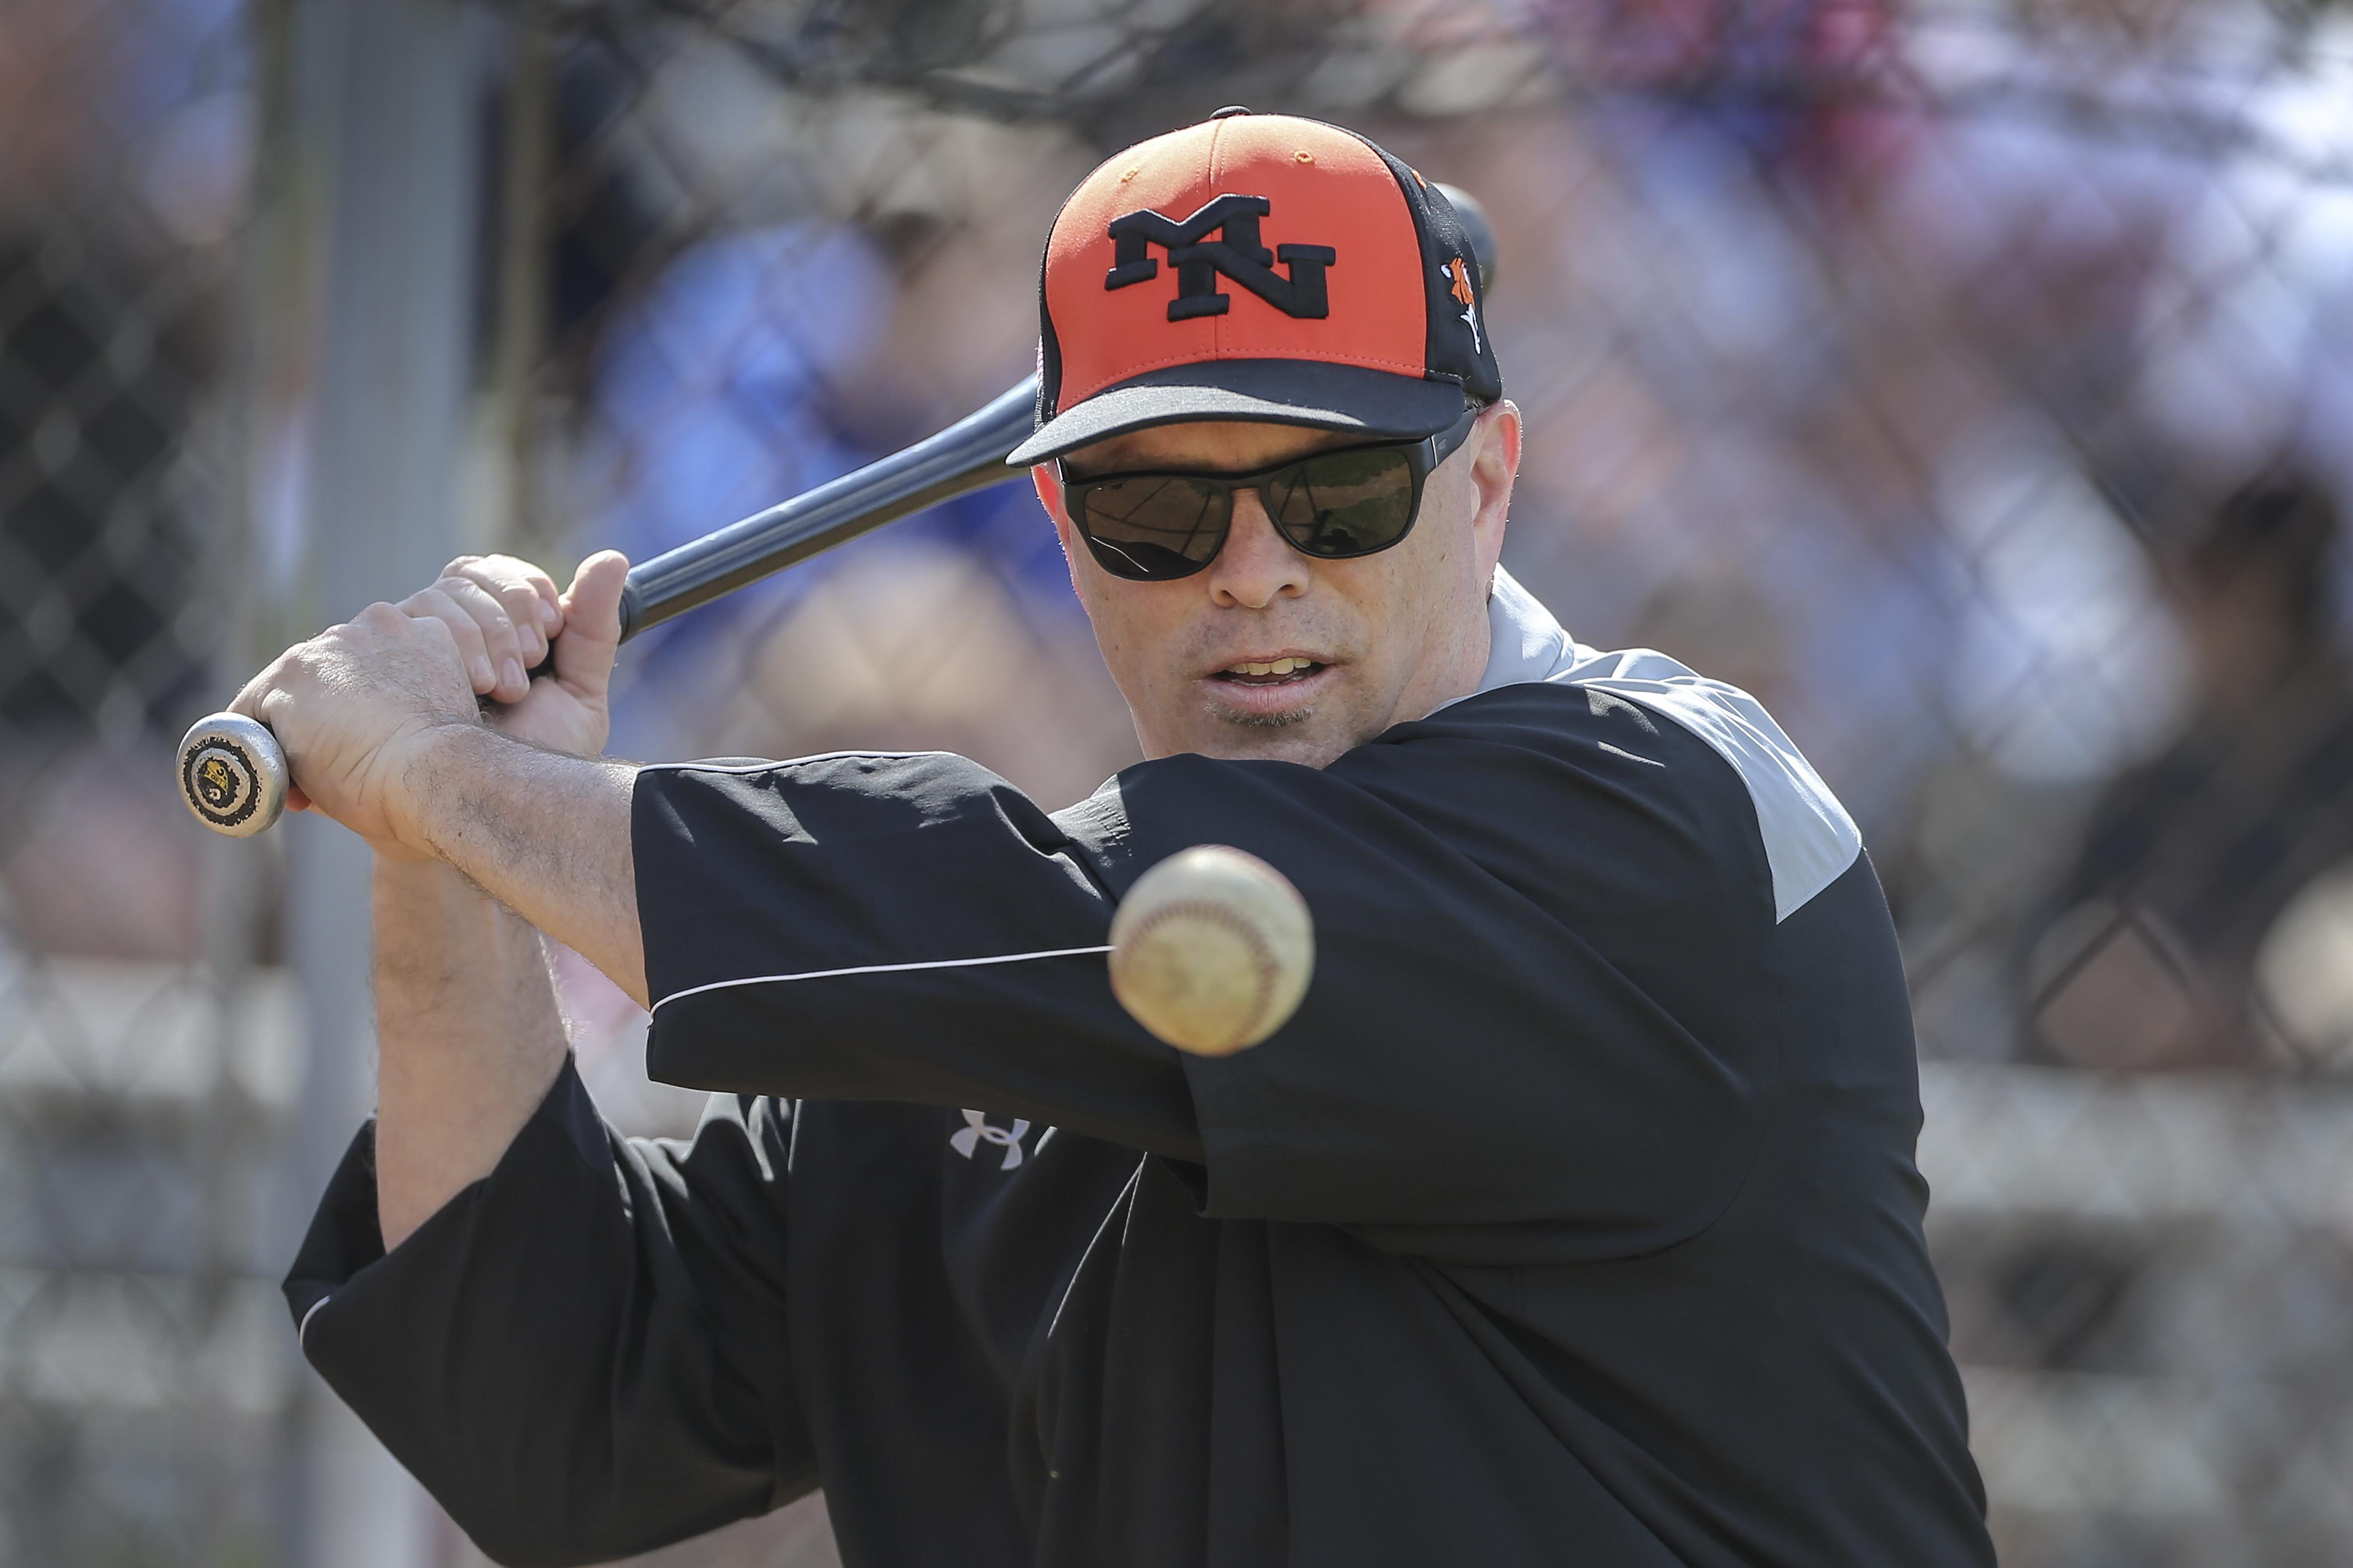 Marple Newtown coach Mark Jordan hits a few during batting practice.